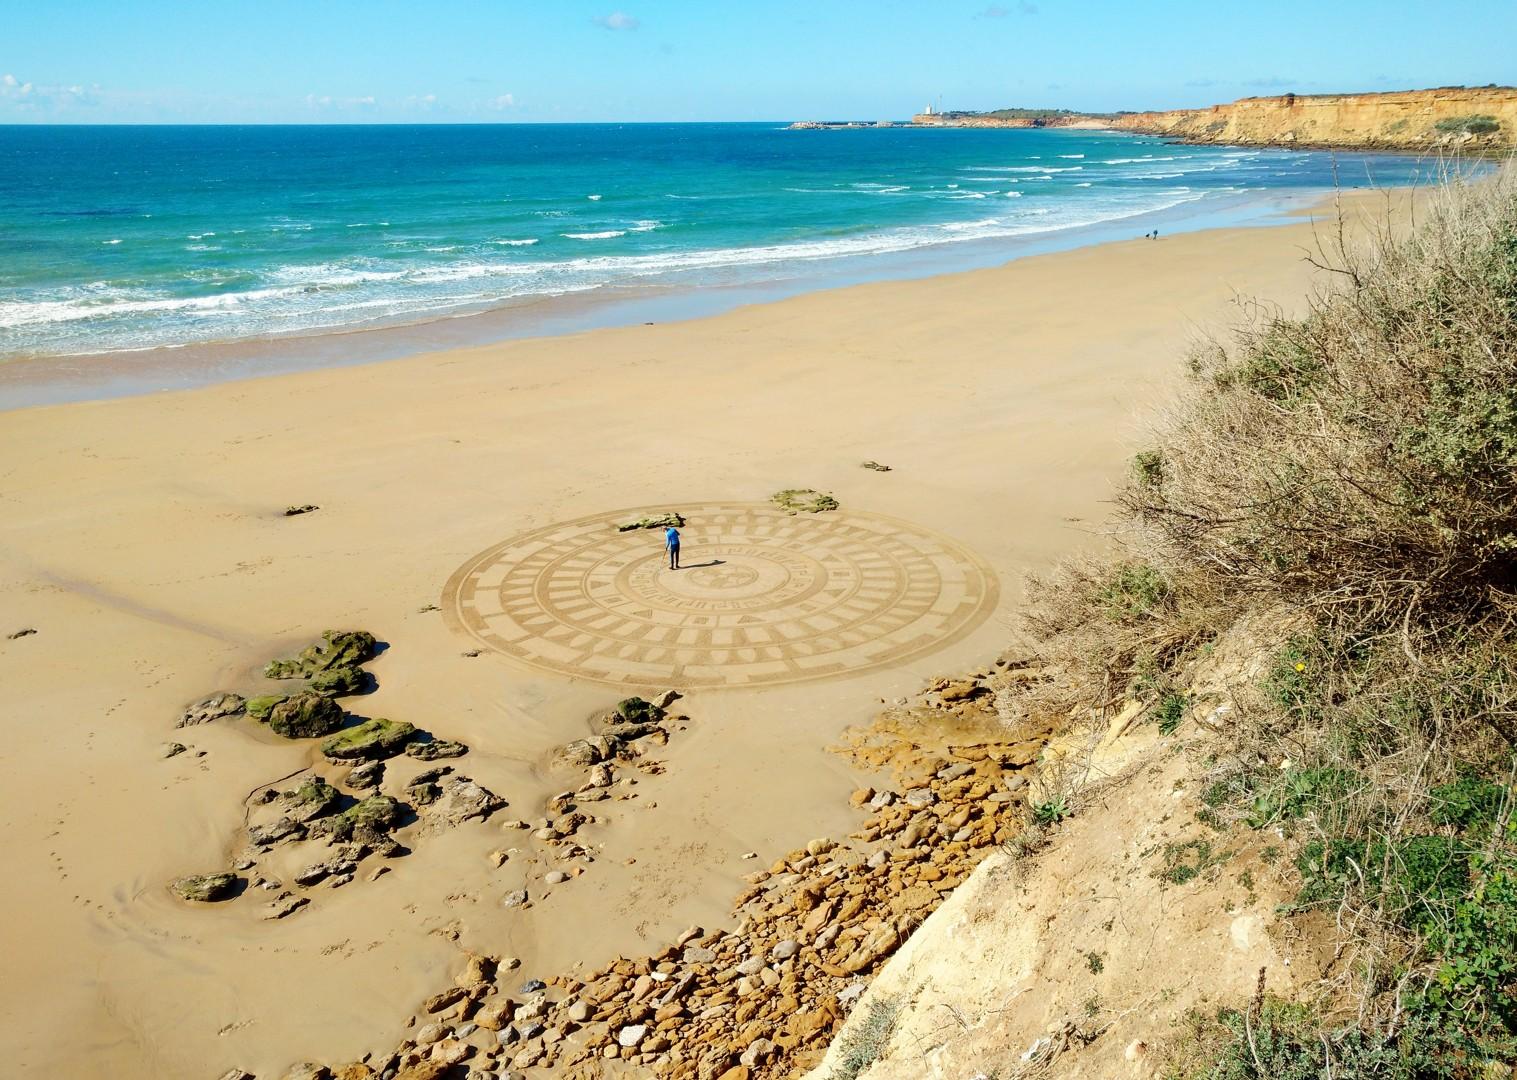 IMG_20180205_125828154.jpg - Southern Spain - Coastal Adventurer - Family Cycling